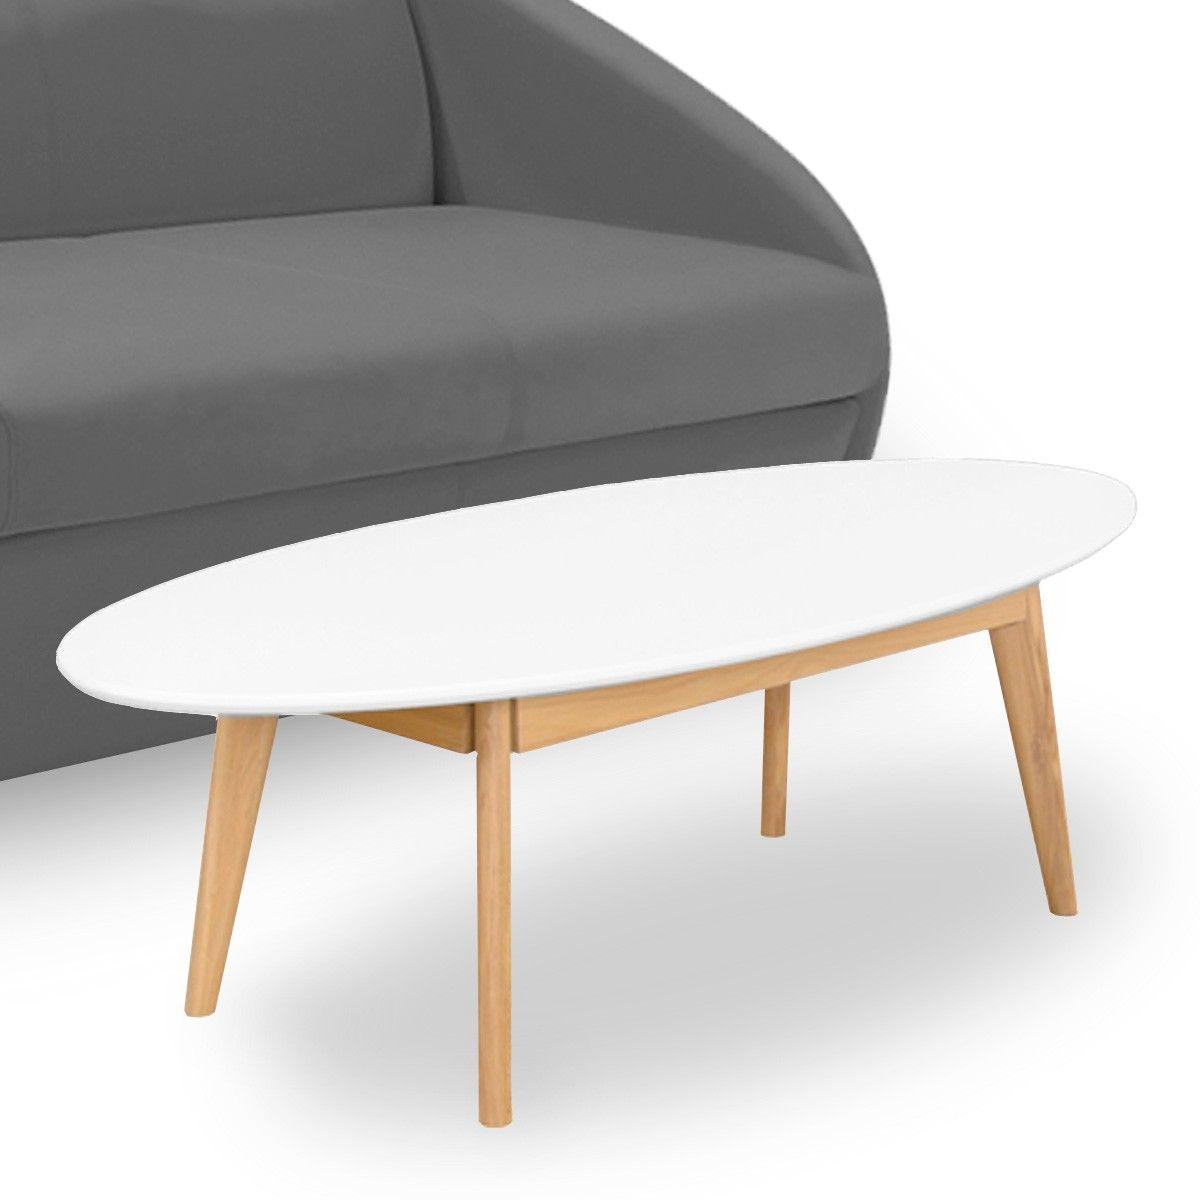 Scandinave Fabriquer Scandinave A Table Table A Scandinave Table Fabriquer TlK1J5F3uc